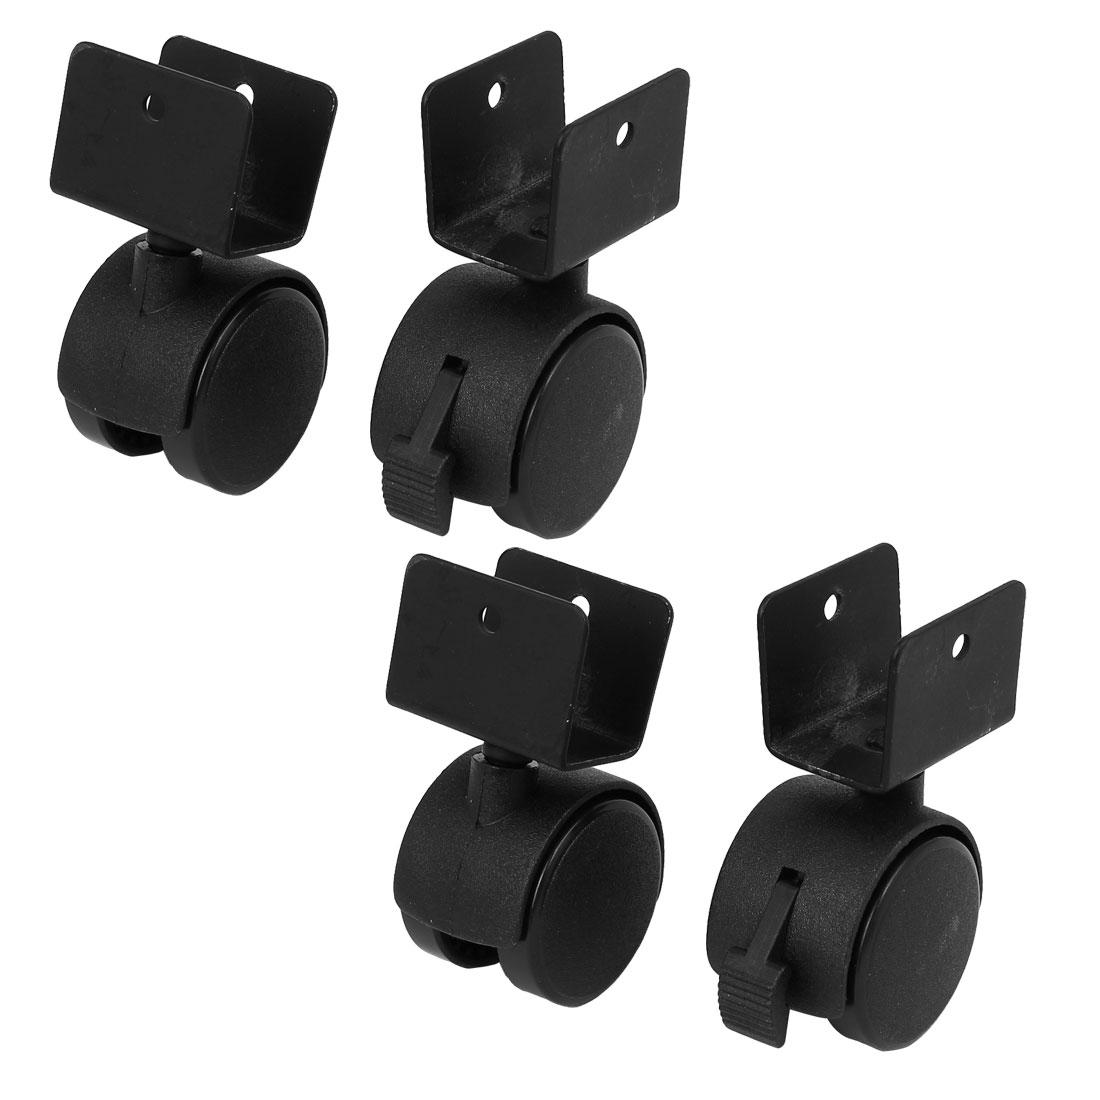 "1.5"" Dia Wheel U-Clamp Top Rotatable Universal Swivel Brake Caster Black 4pcs"